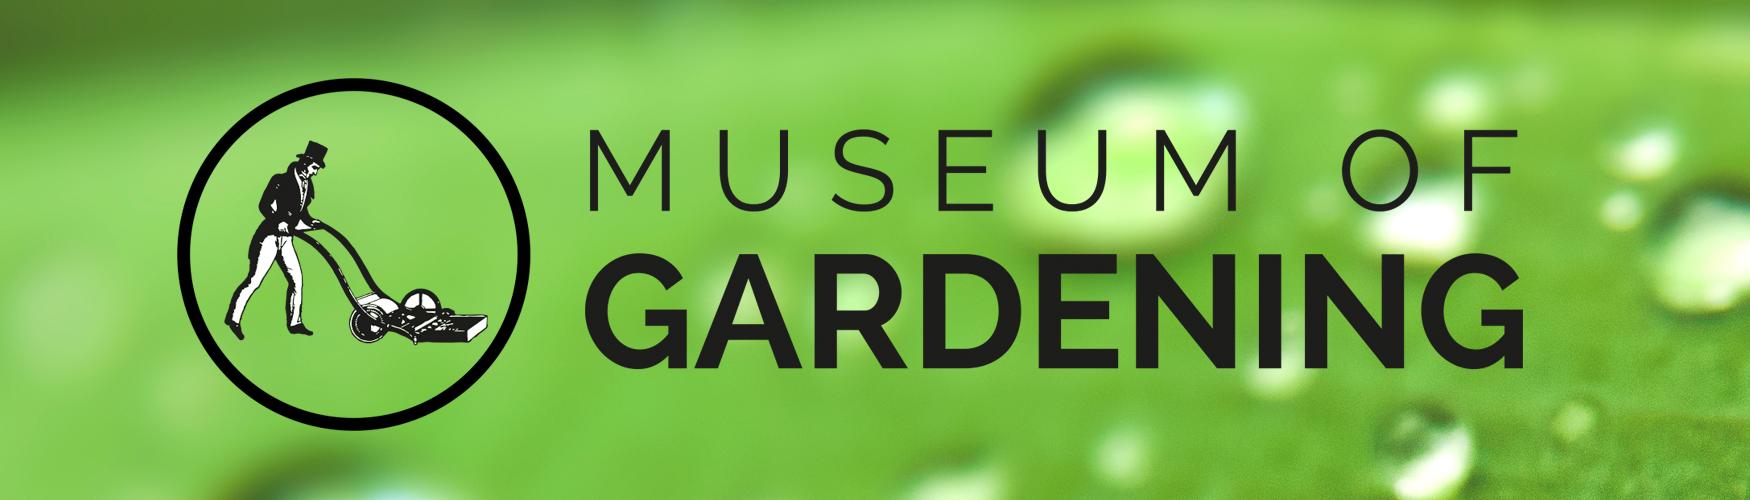 banner-museum